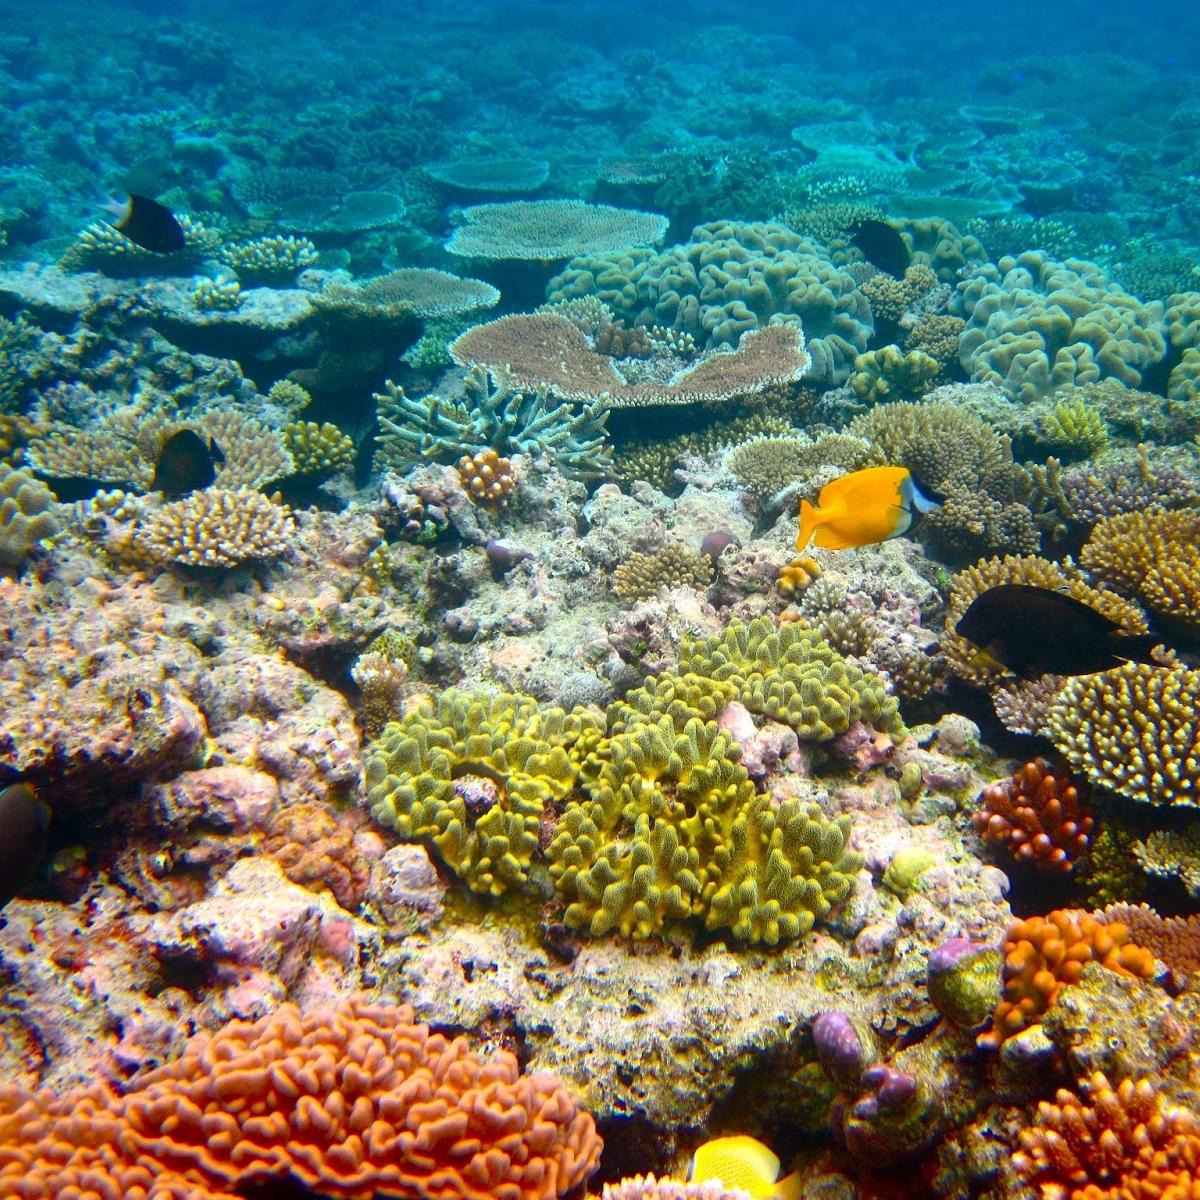 New disease hits coral reefs